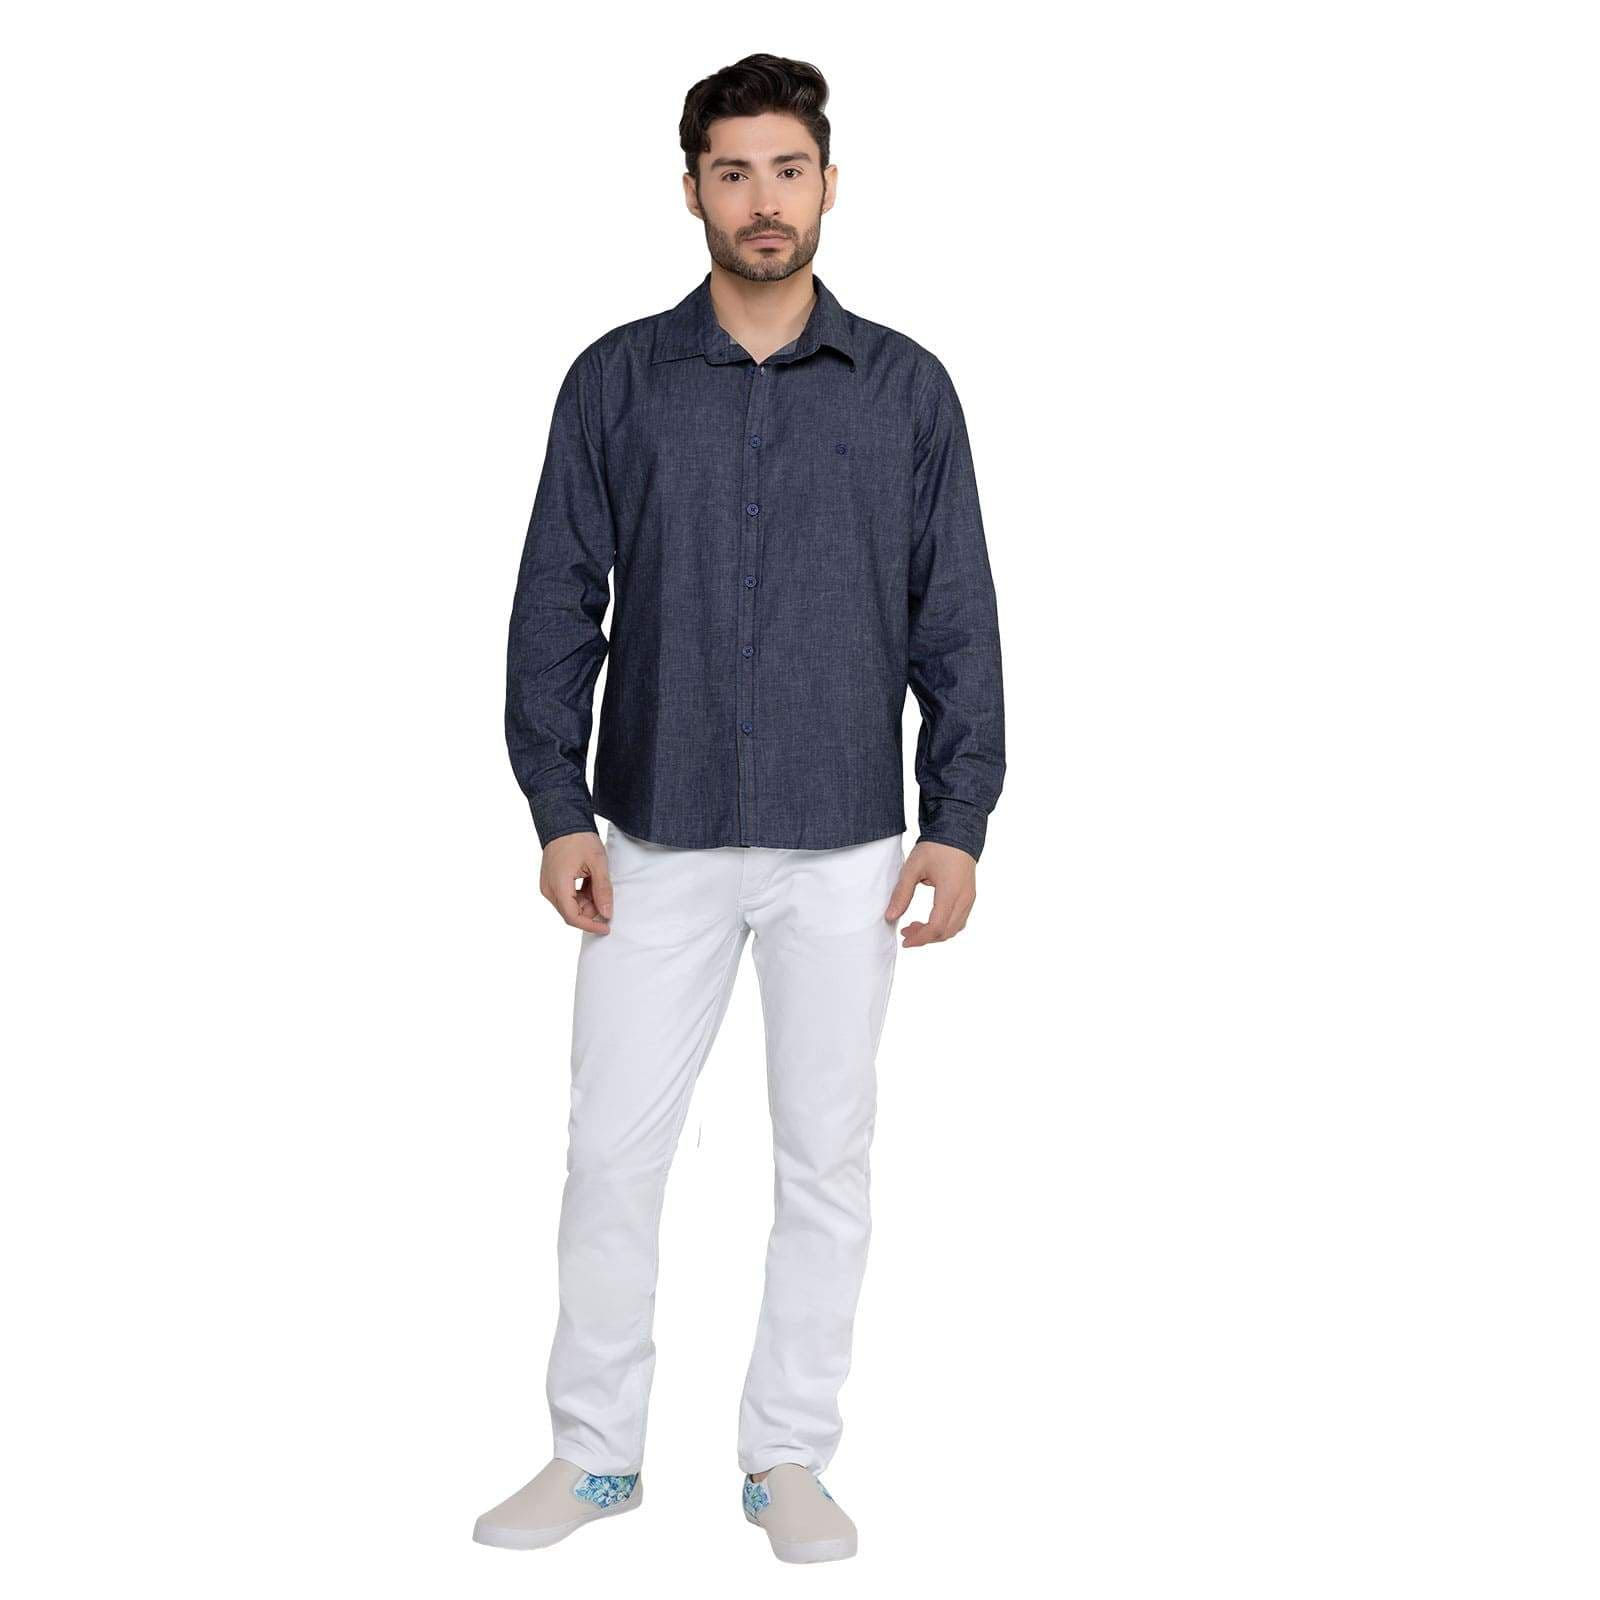 Camisa Jeans Masculina Manga Longa Jeans Escuro